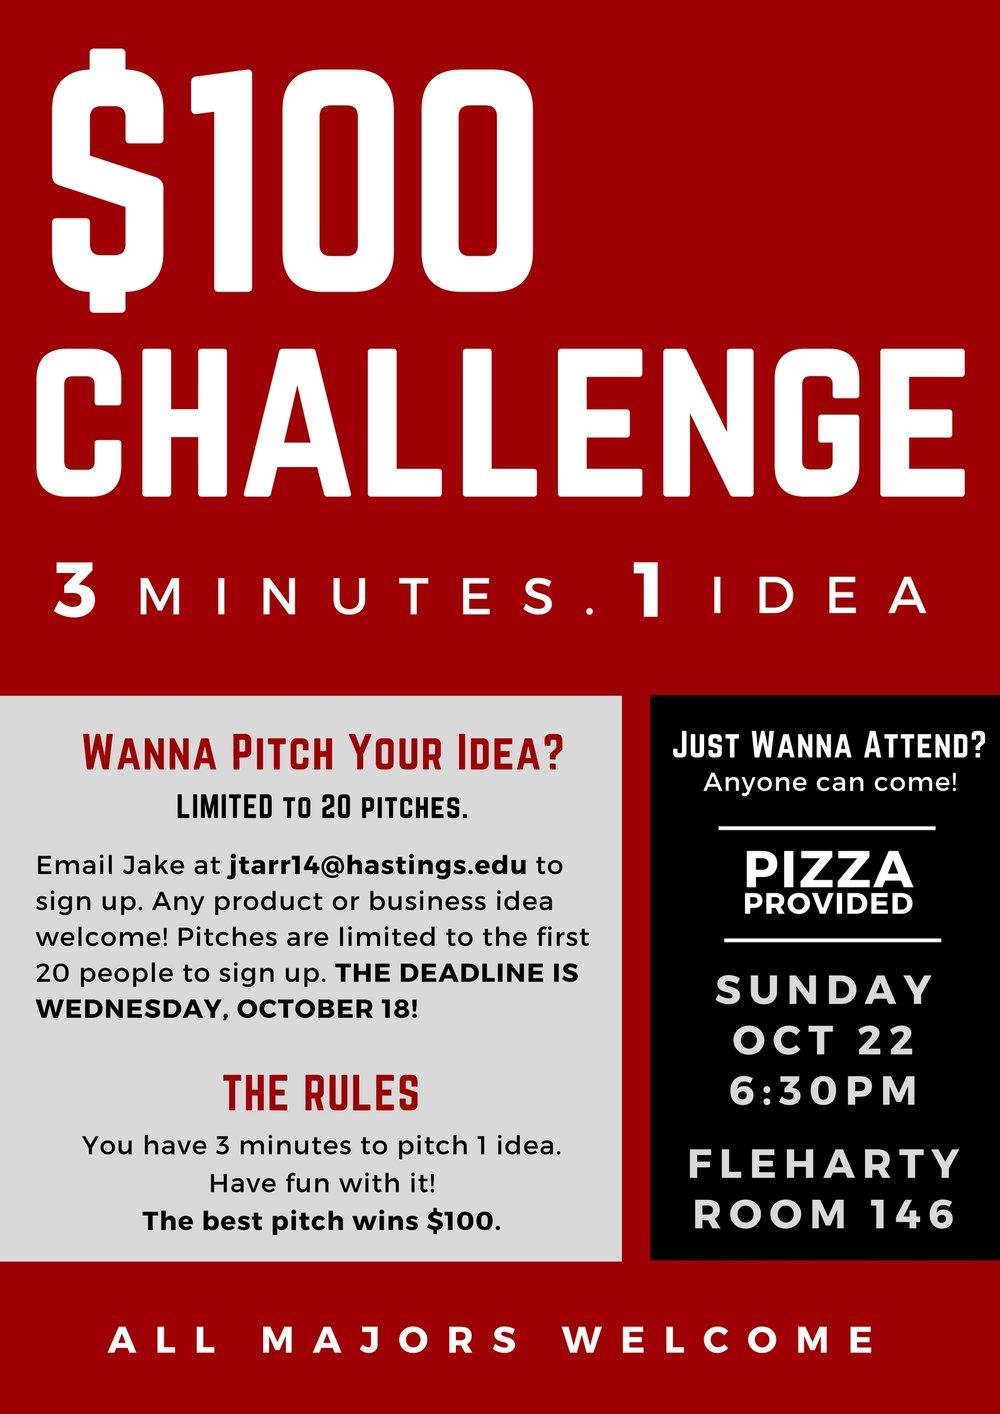 100_challenge_hc_poster.jpg